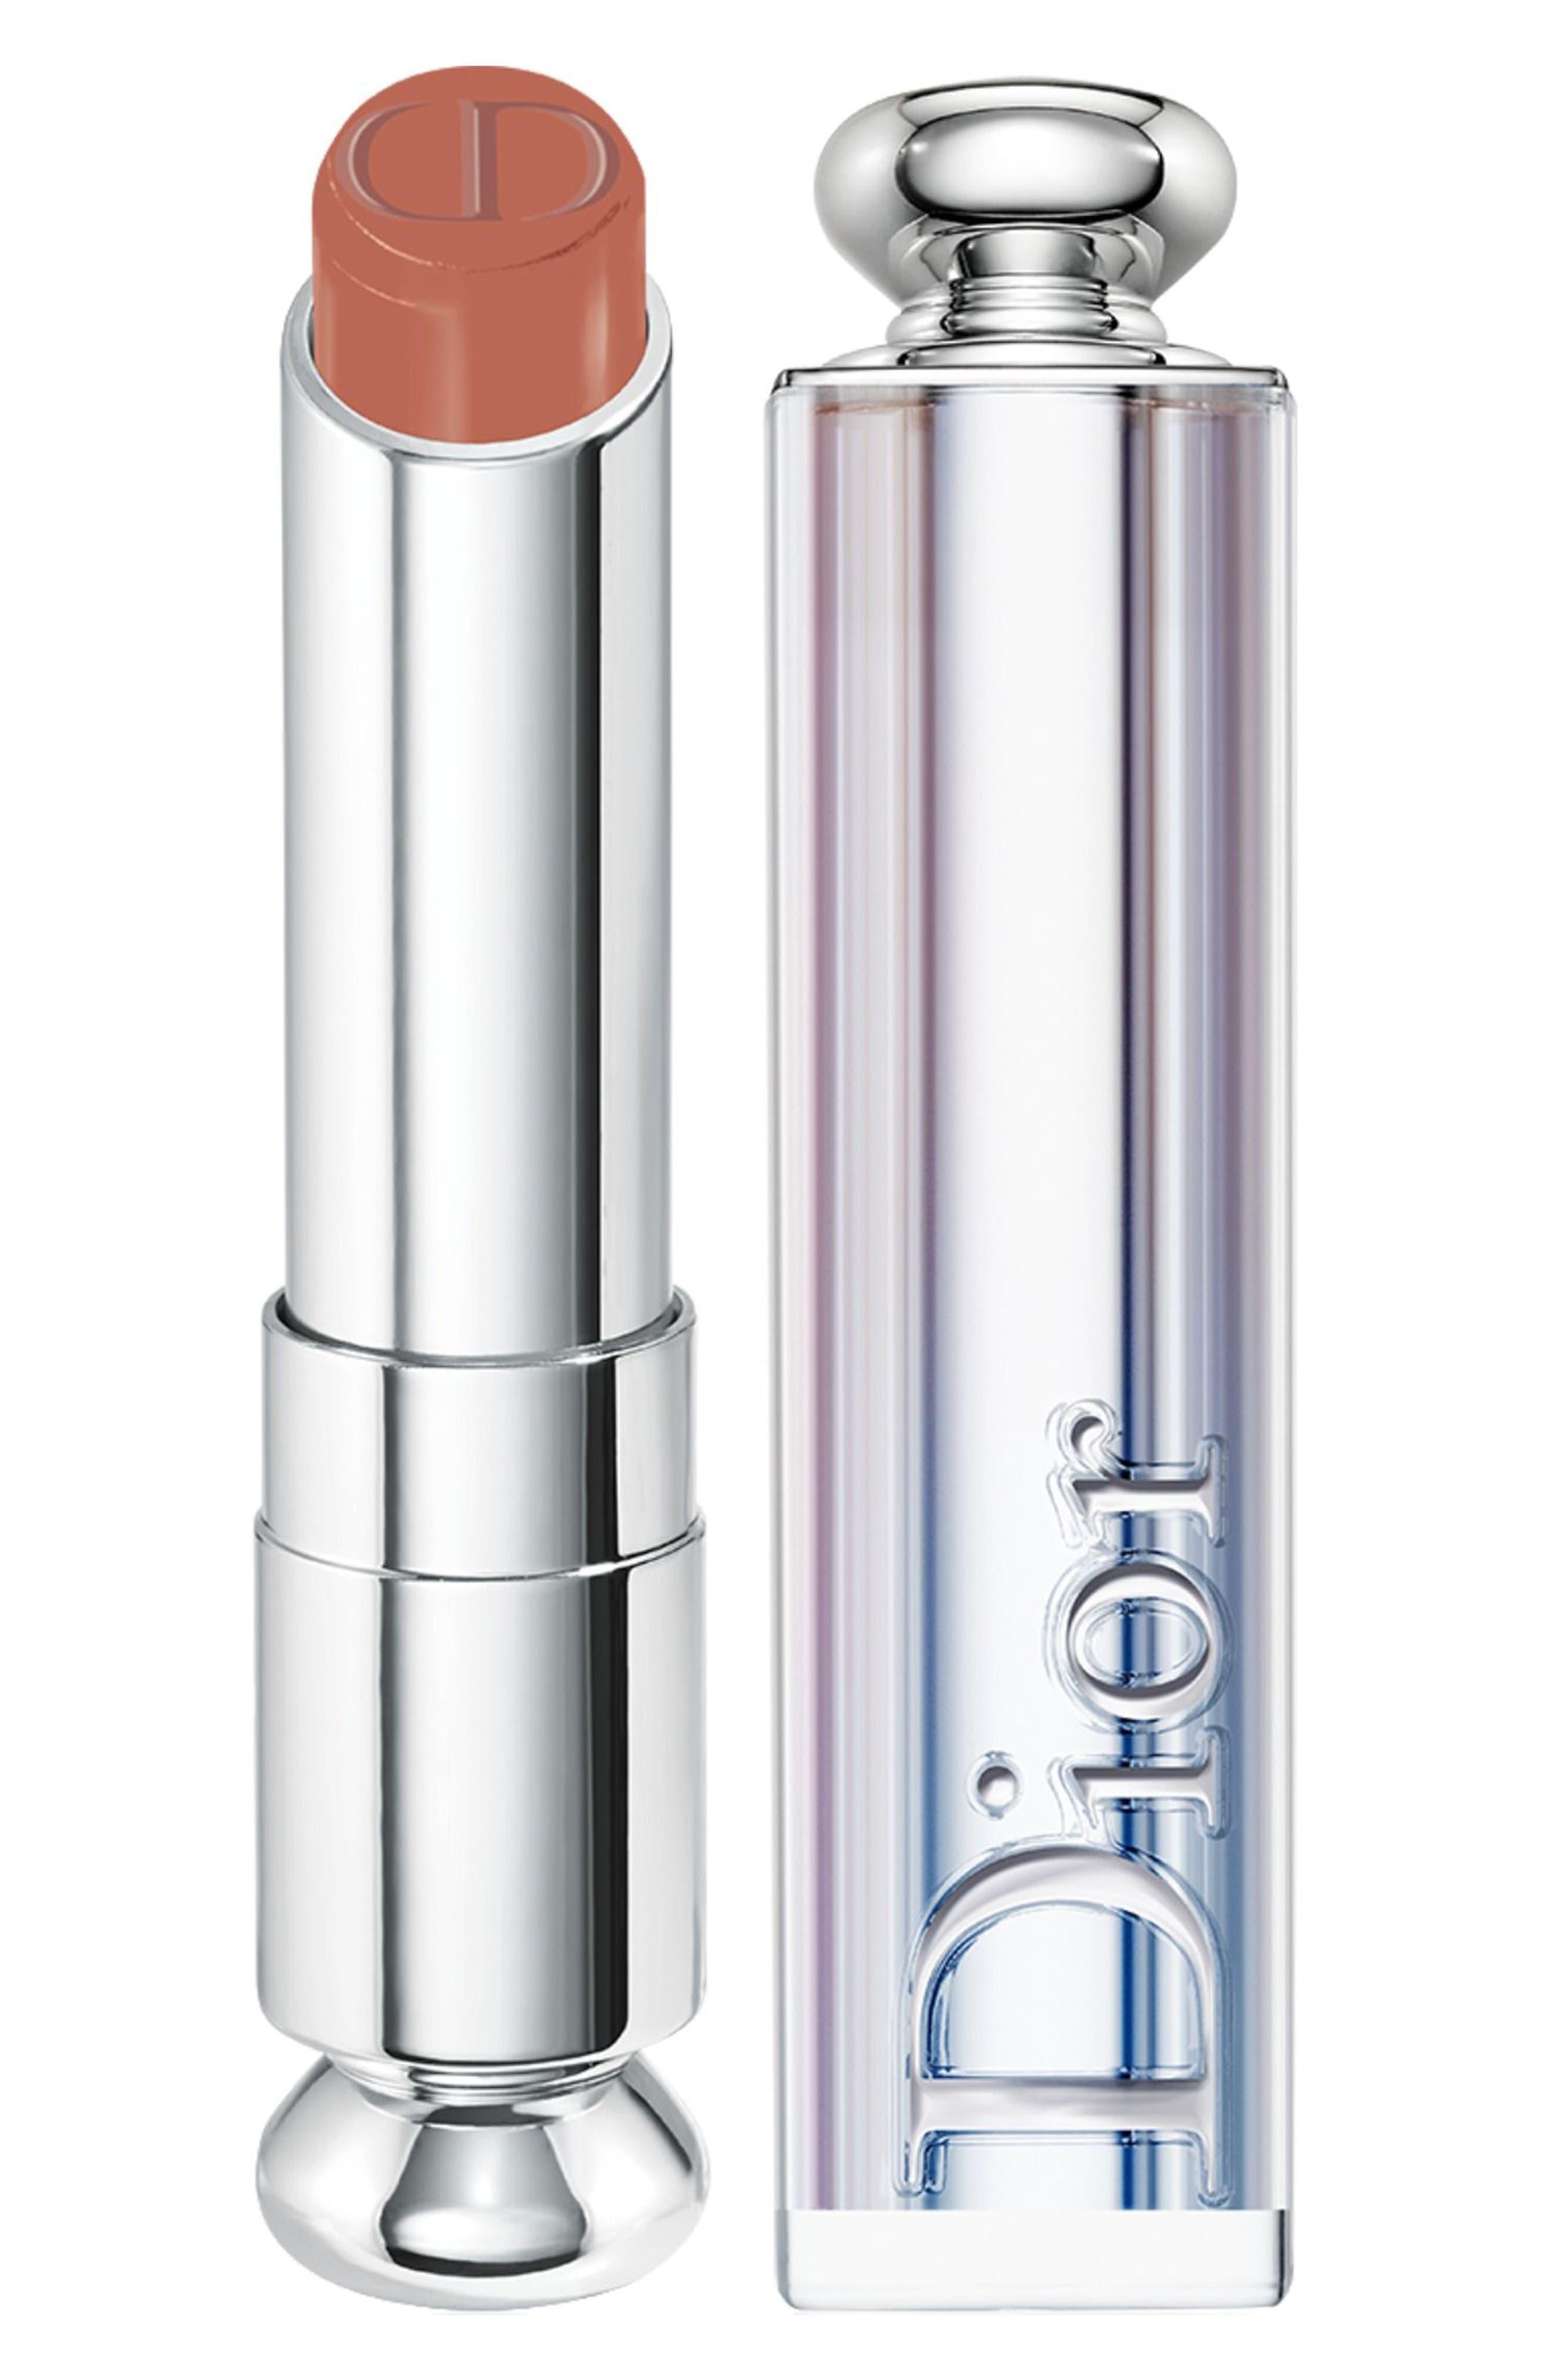 Dior Addict Cooling Lipstick - 411 Nude Chill